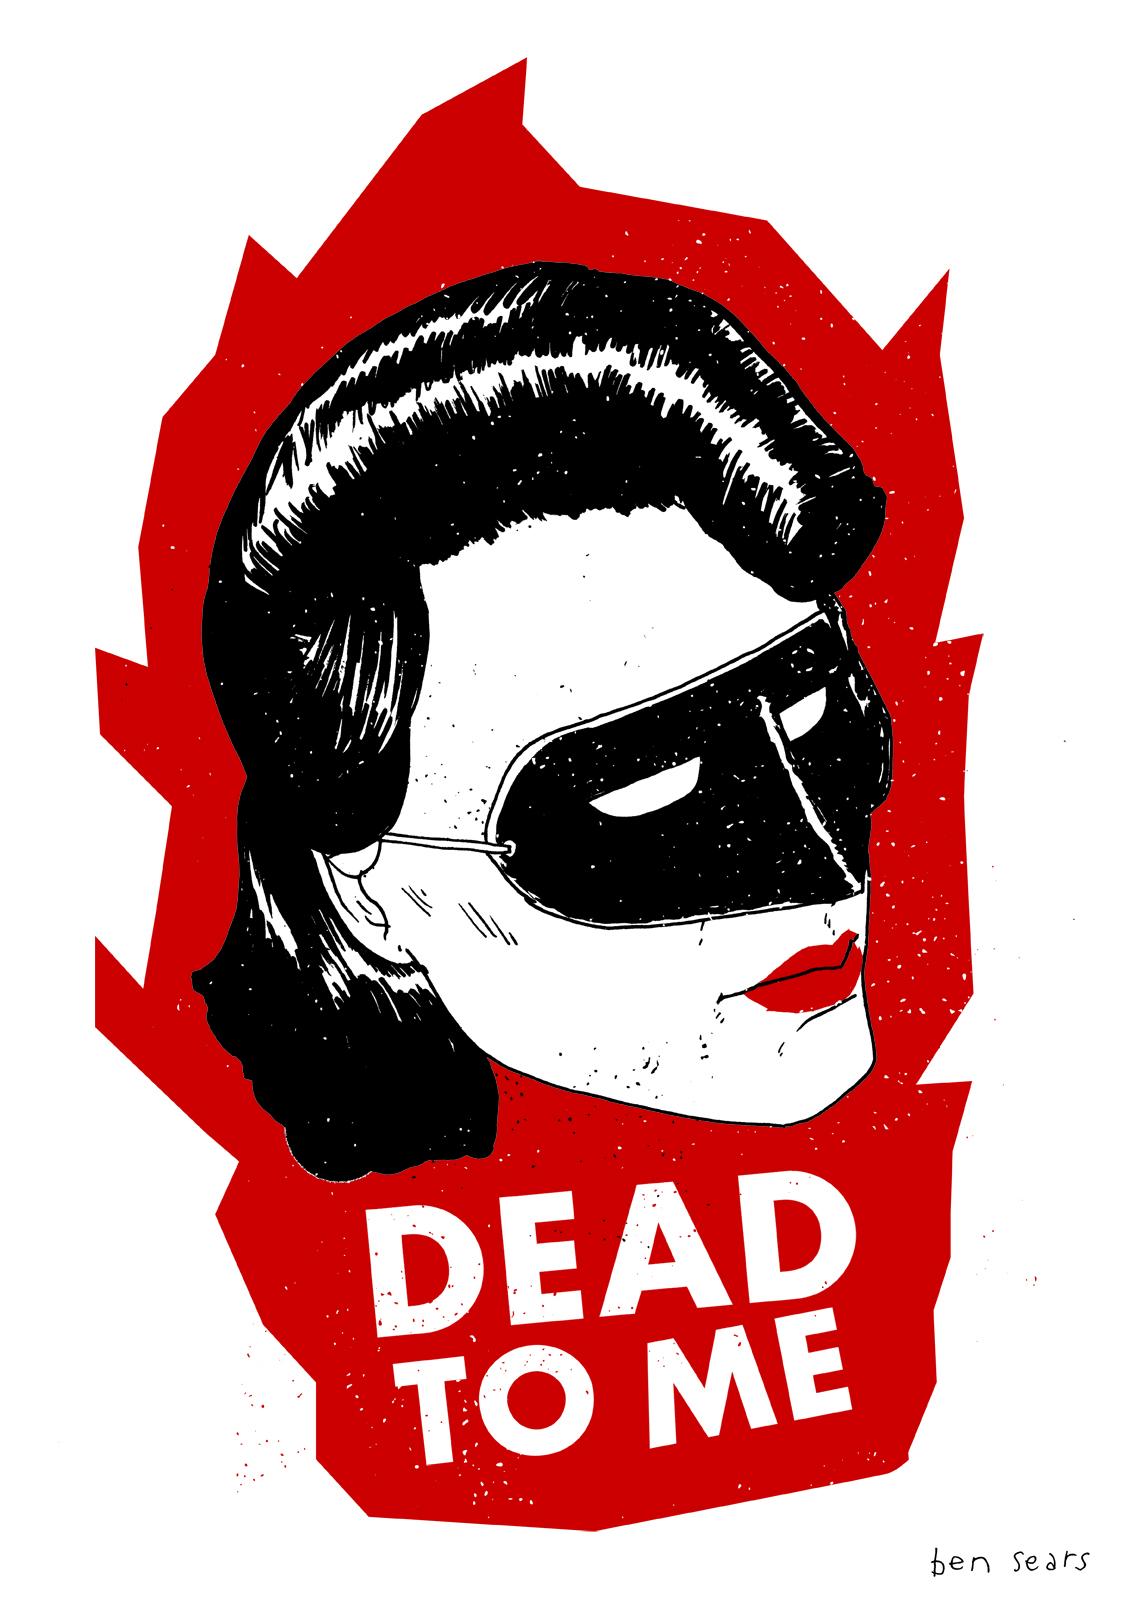 Ben Sears 'Dead To Me' |  via: bensears